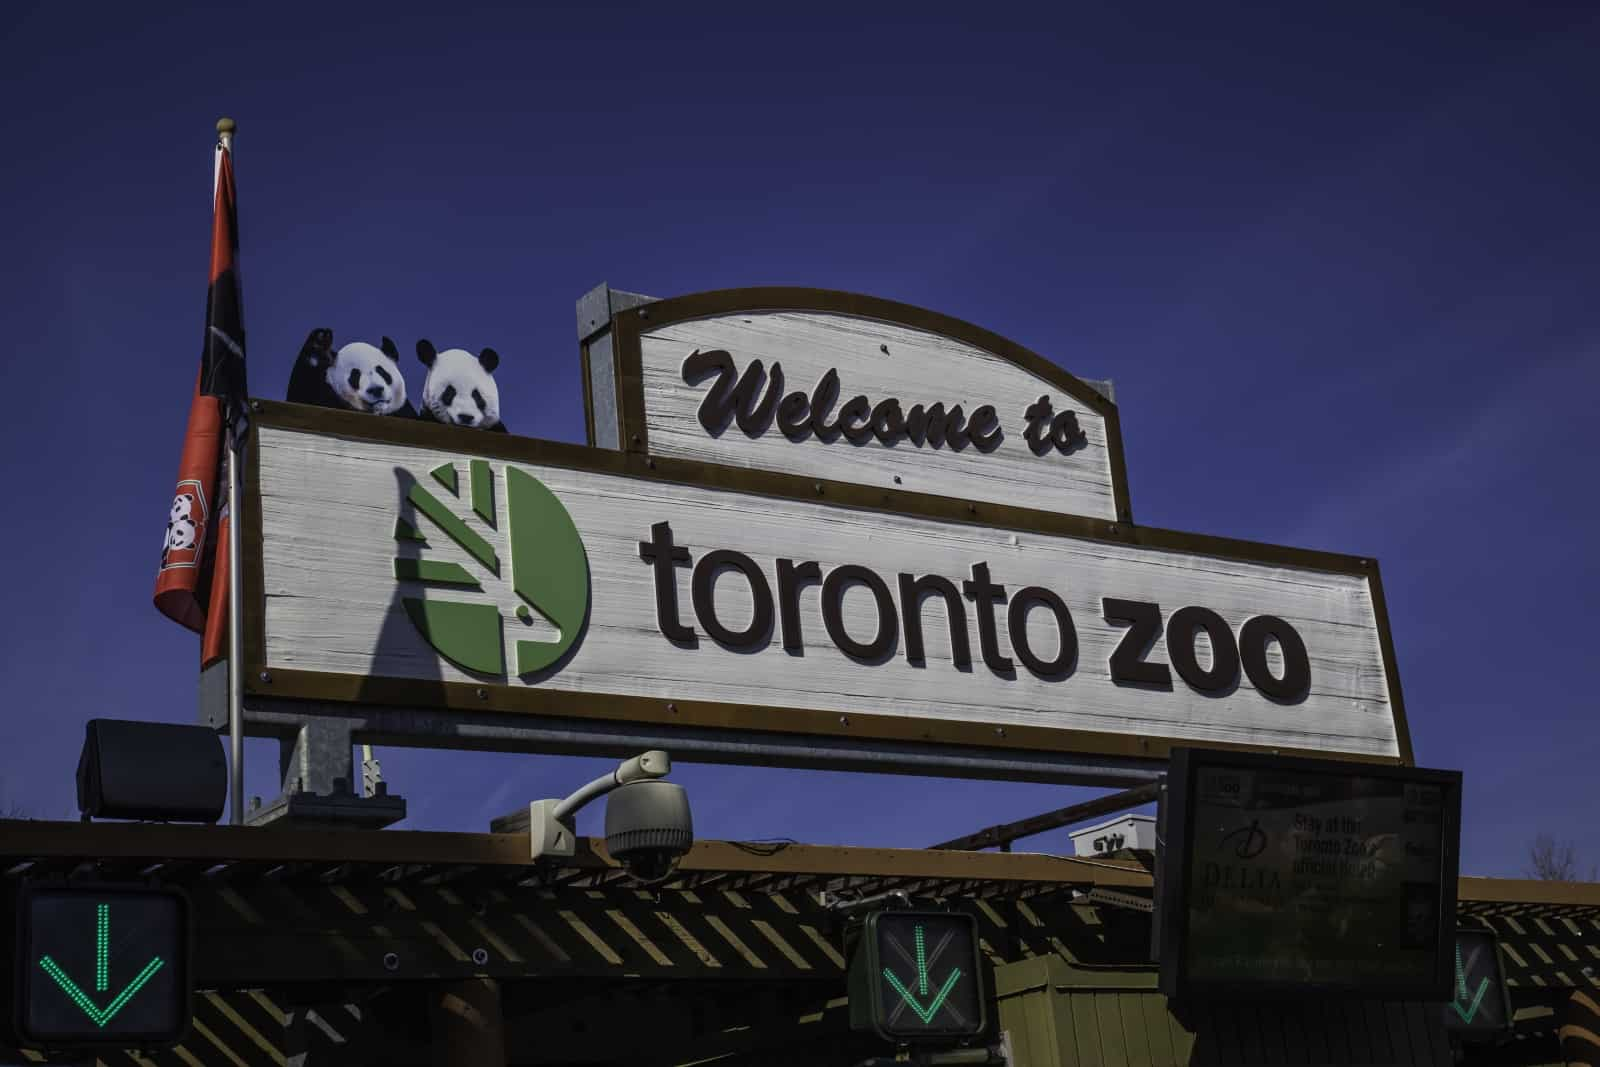 Toronto Zoo. Foto JHVEPhoto